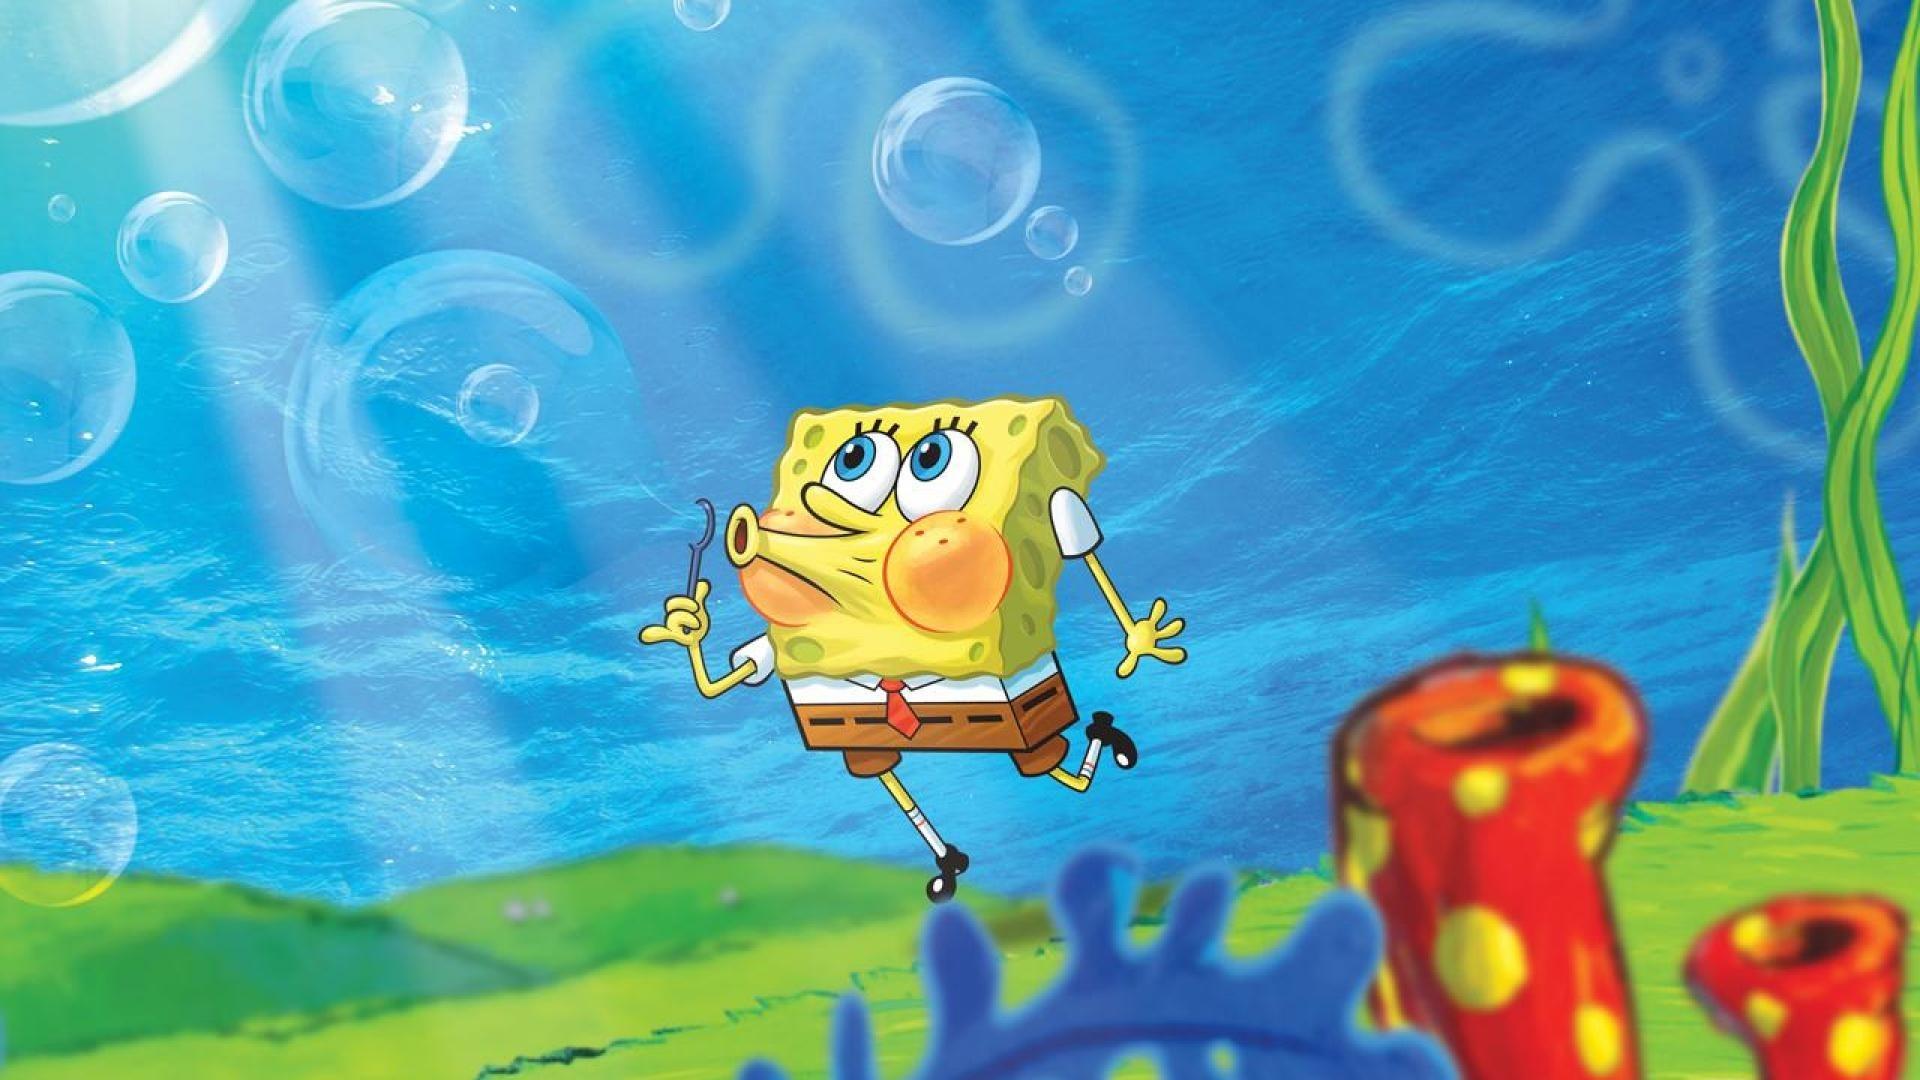 Spongebob And Patrick Wallpaper HD